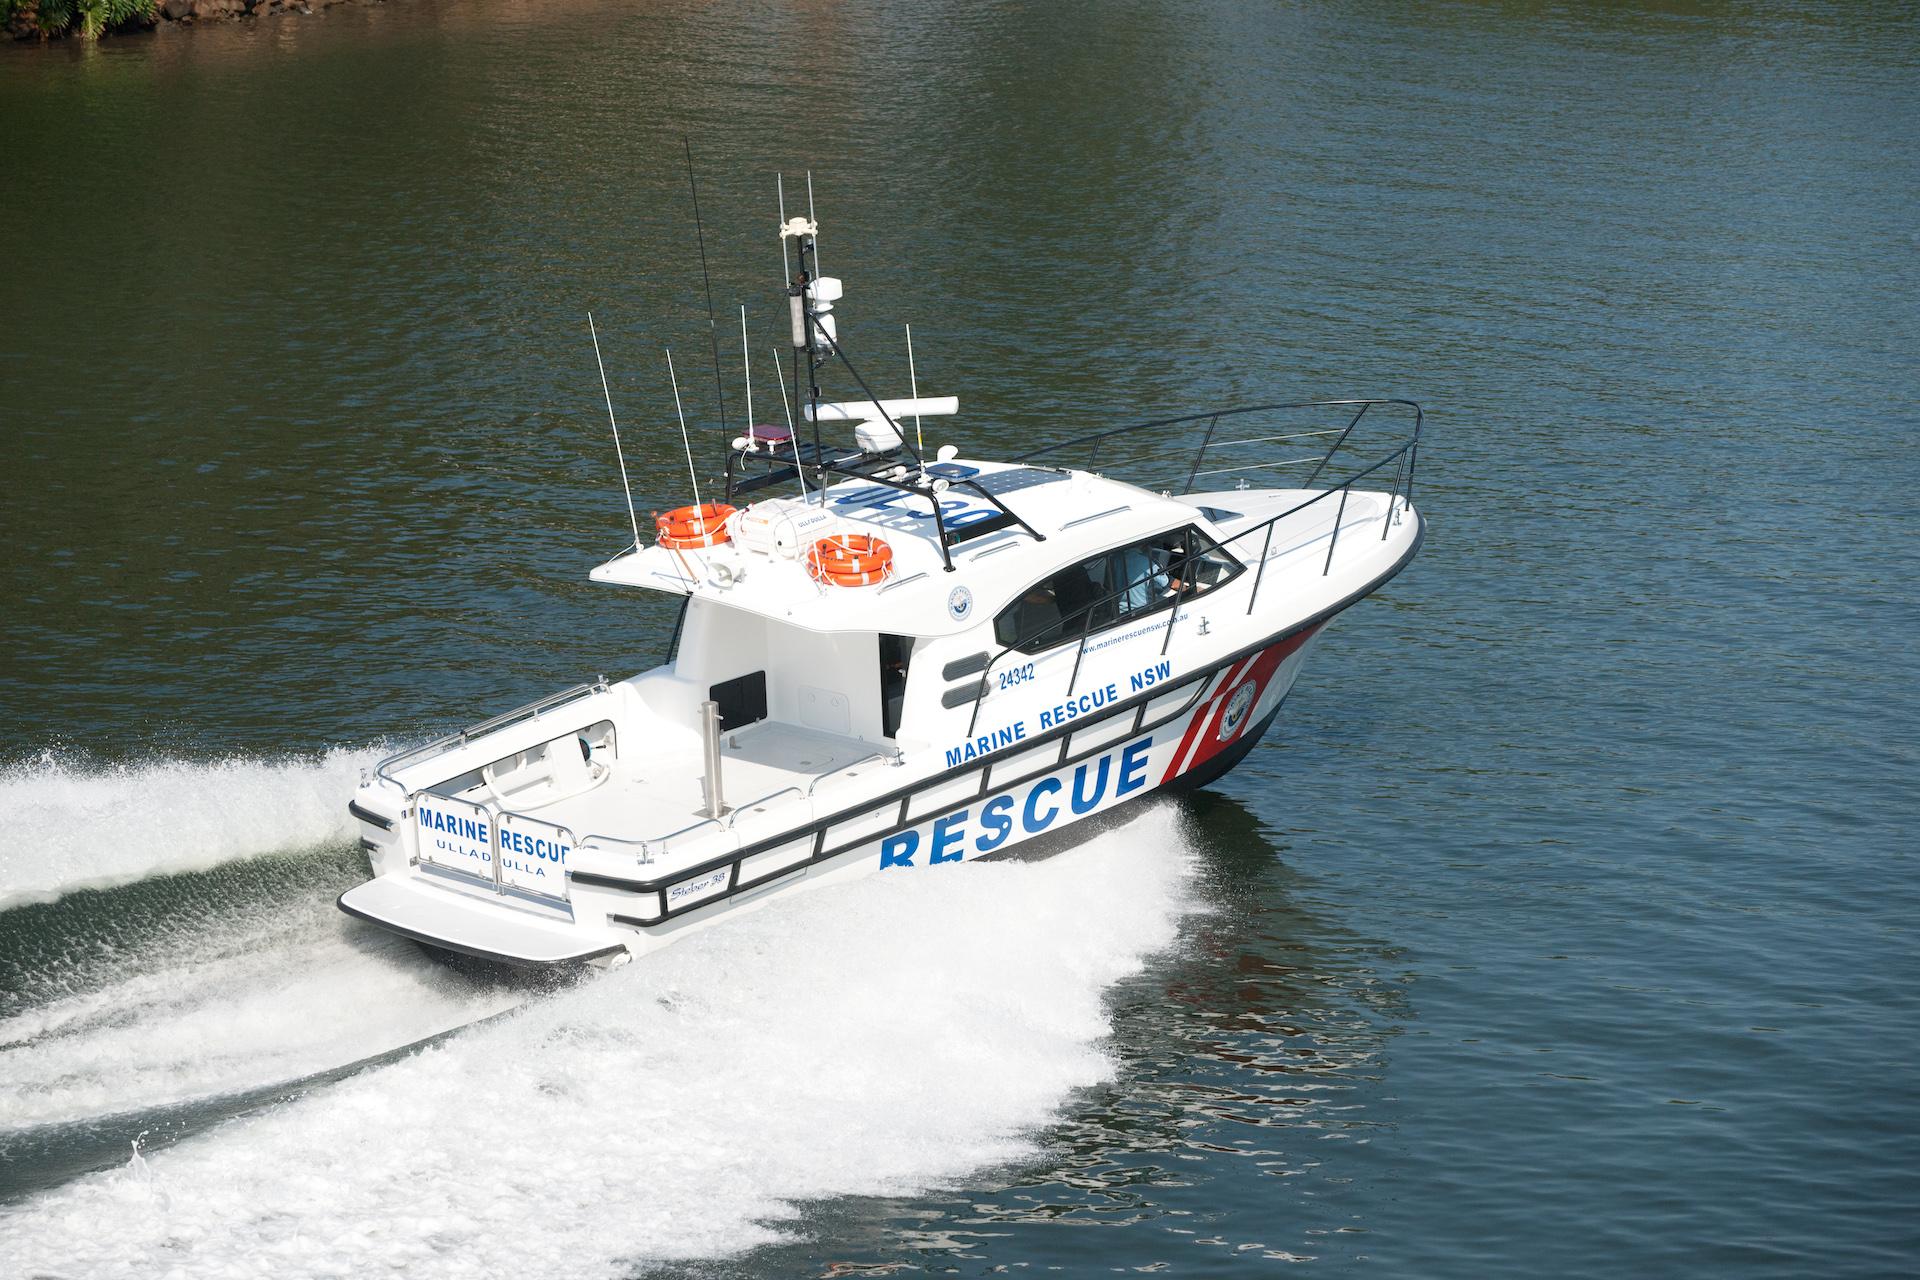 Steber 38ft SLR Marine Rescue - Ulladulla, NSW